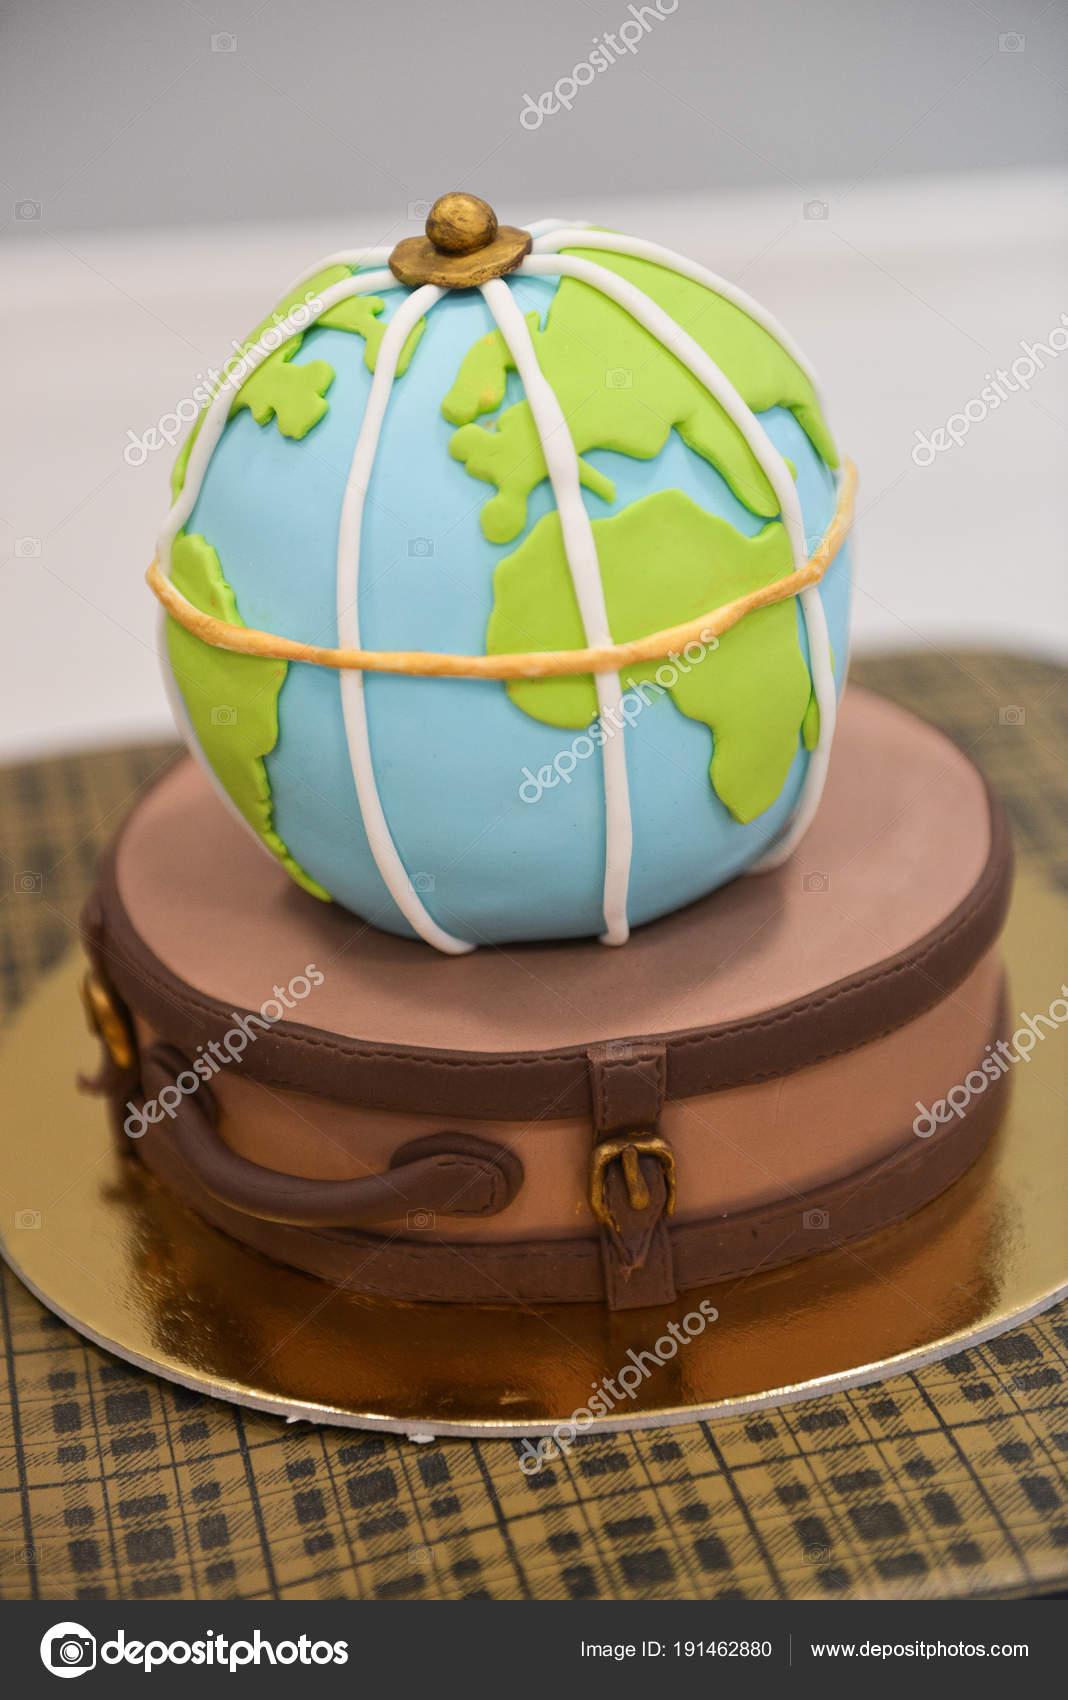 Childrens Themed Birthday Travel Smash The Cake Sweet Globe On A